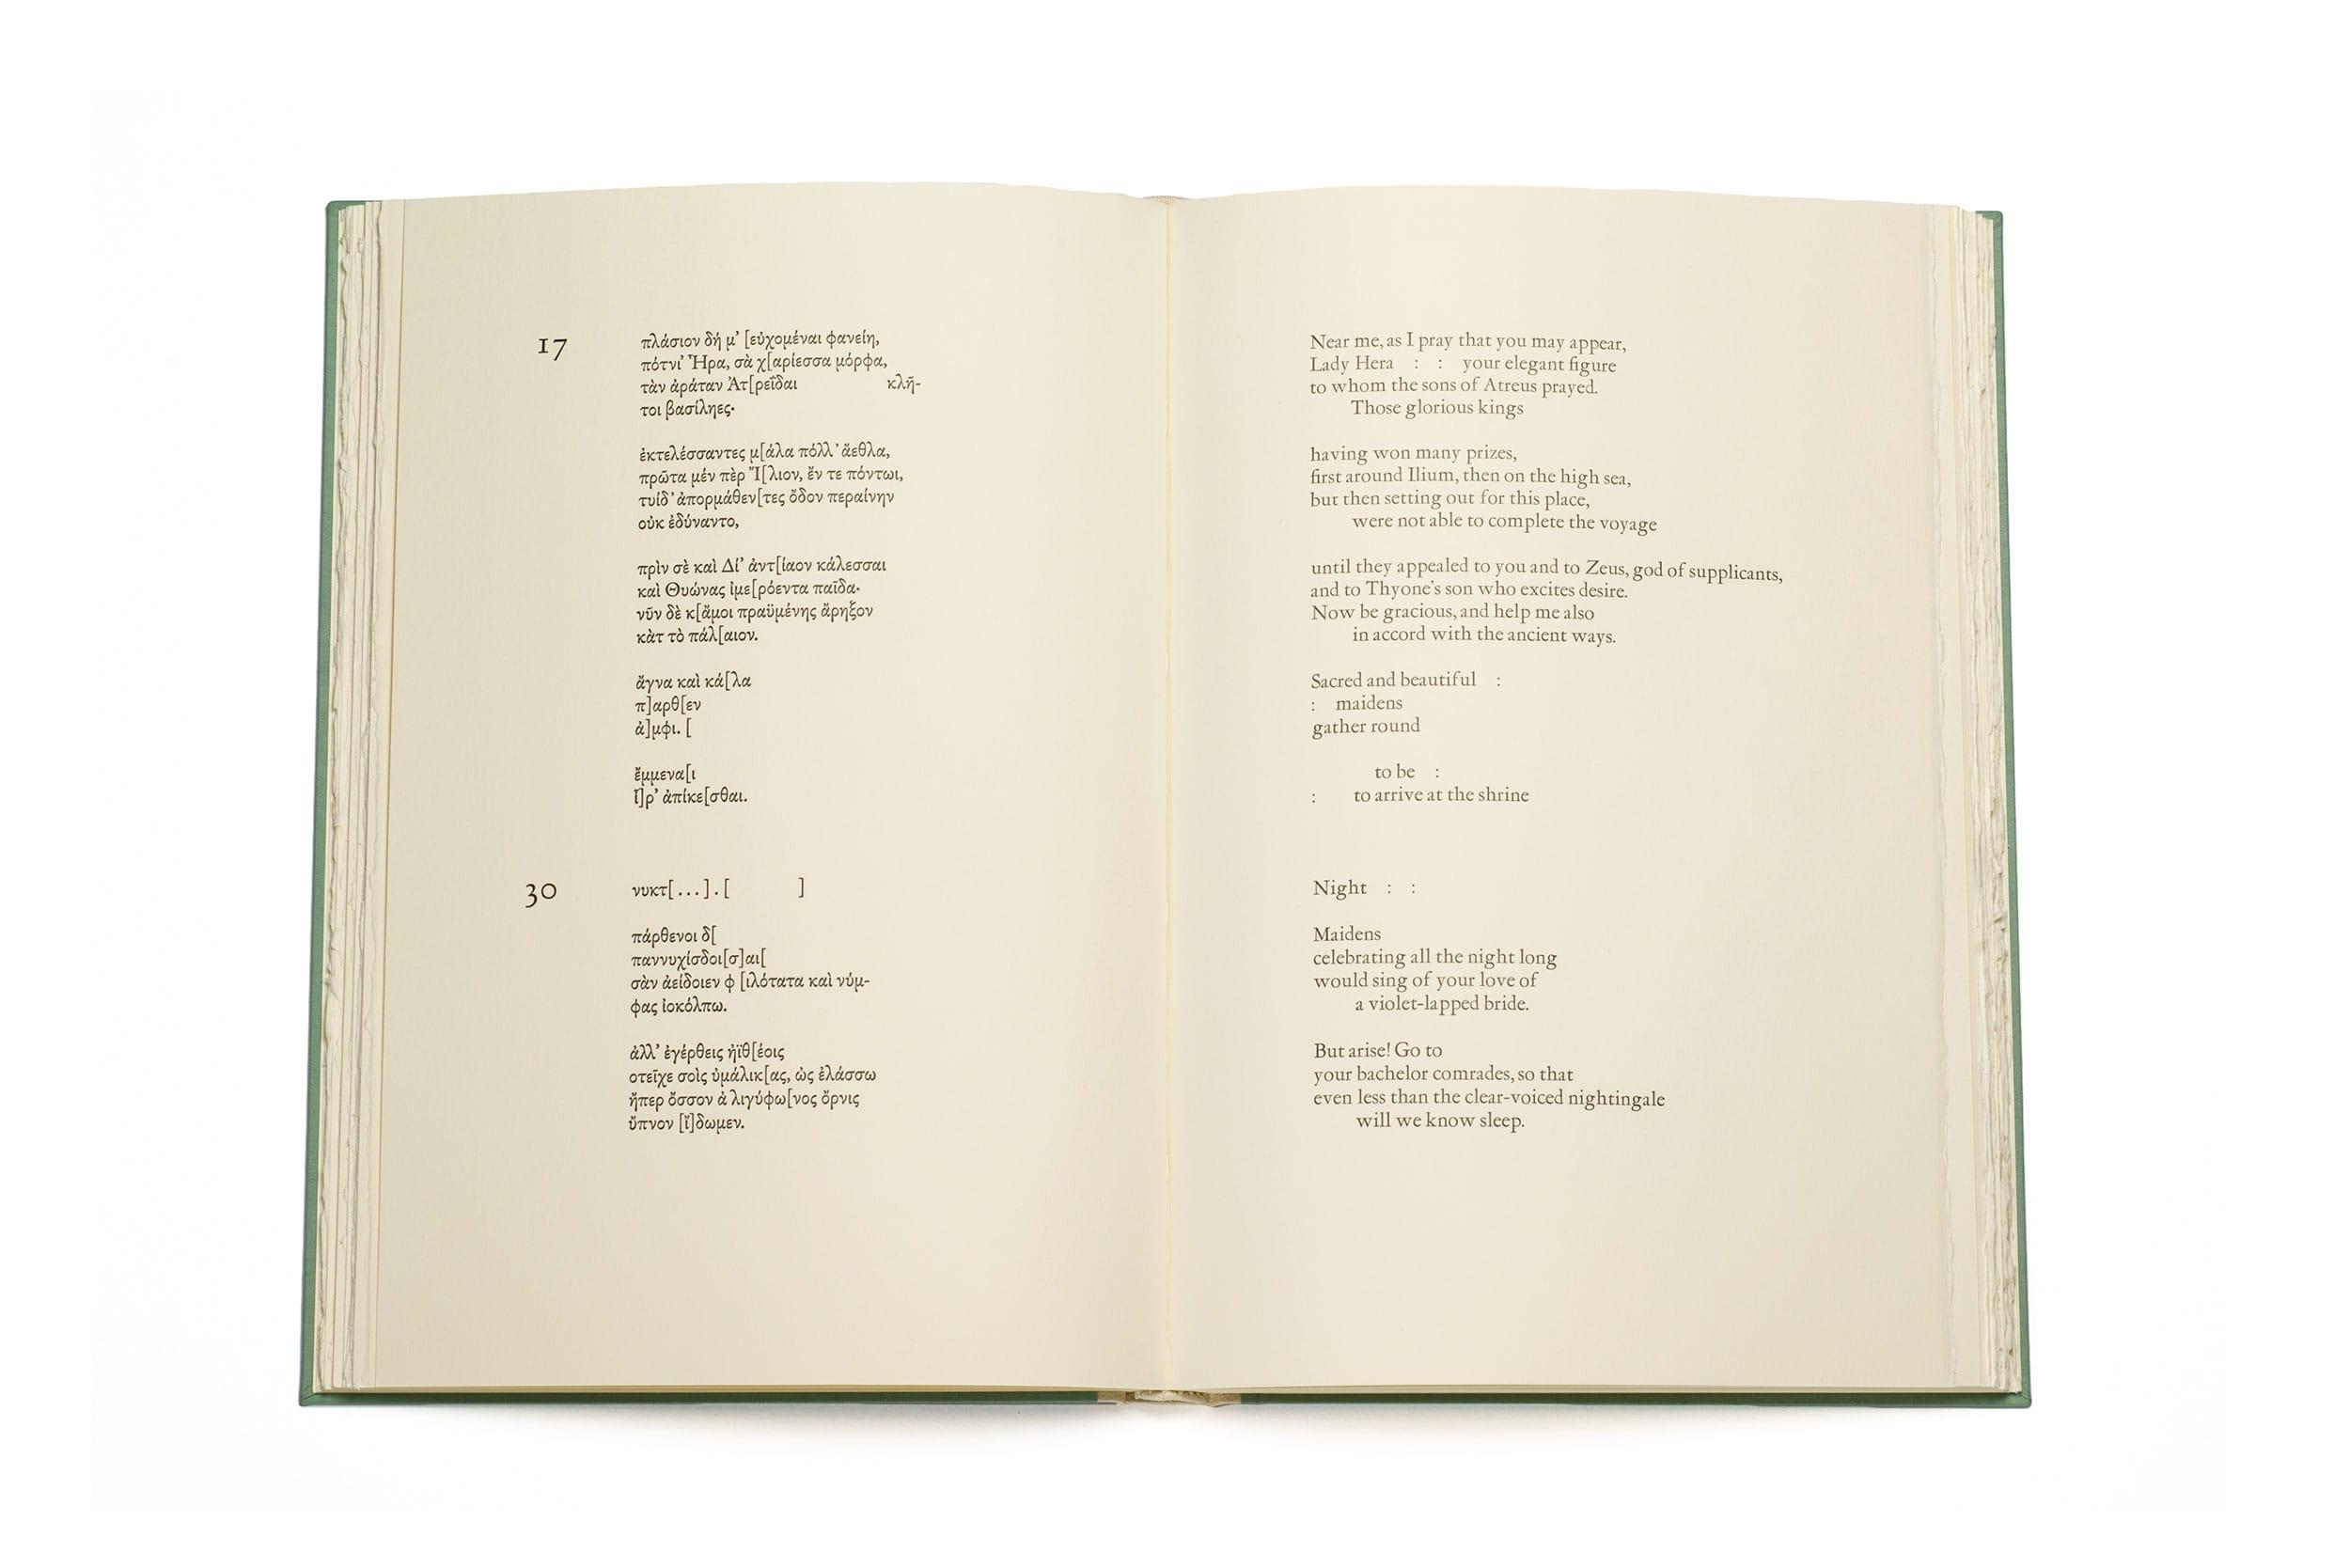 093_Poetry_of_Sappho-Spread-01.jpg